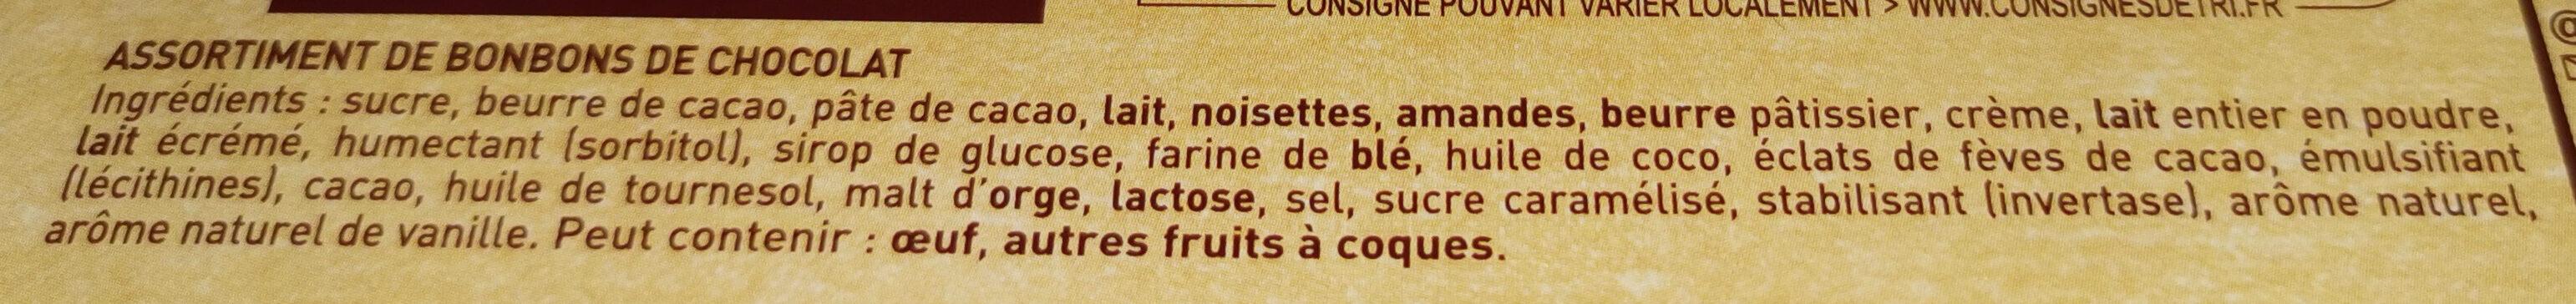 les gourmands noir & lait - Ingrediënten - fr